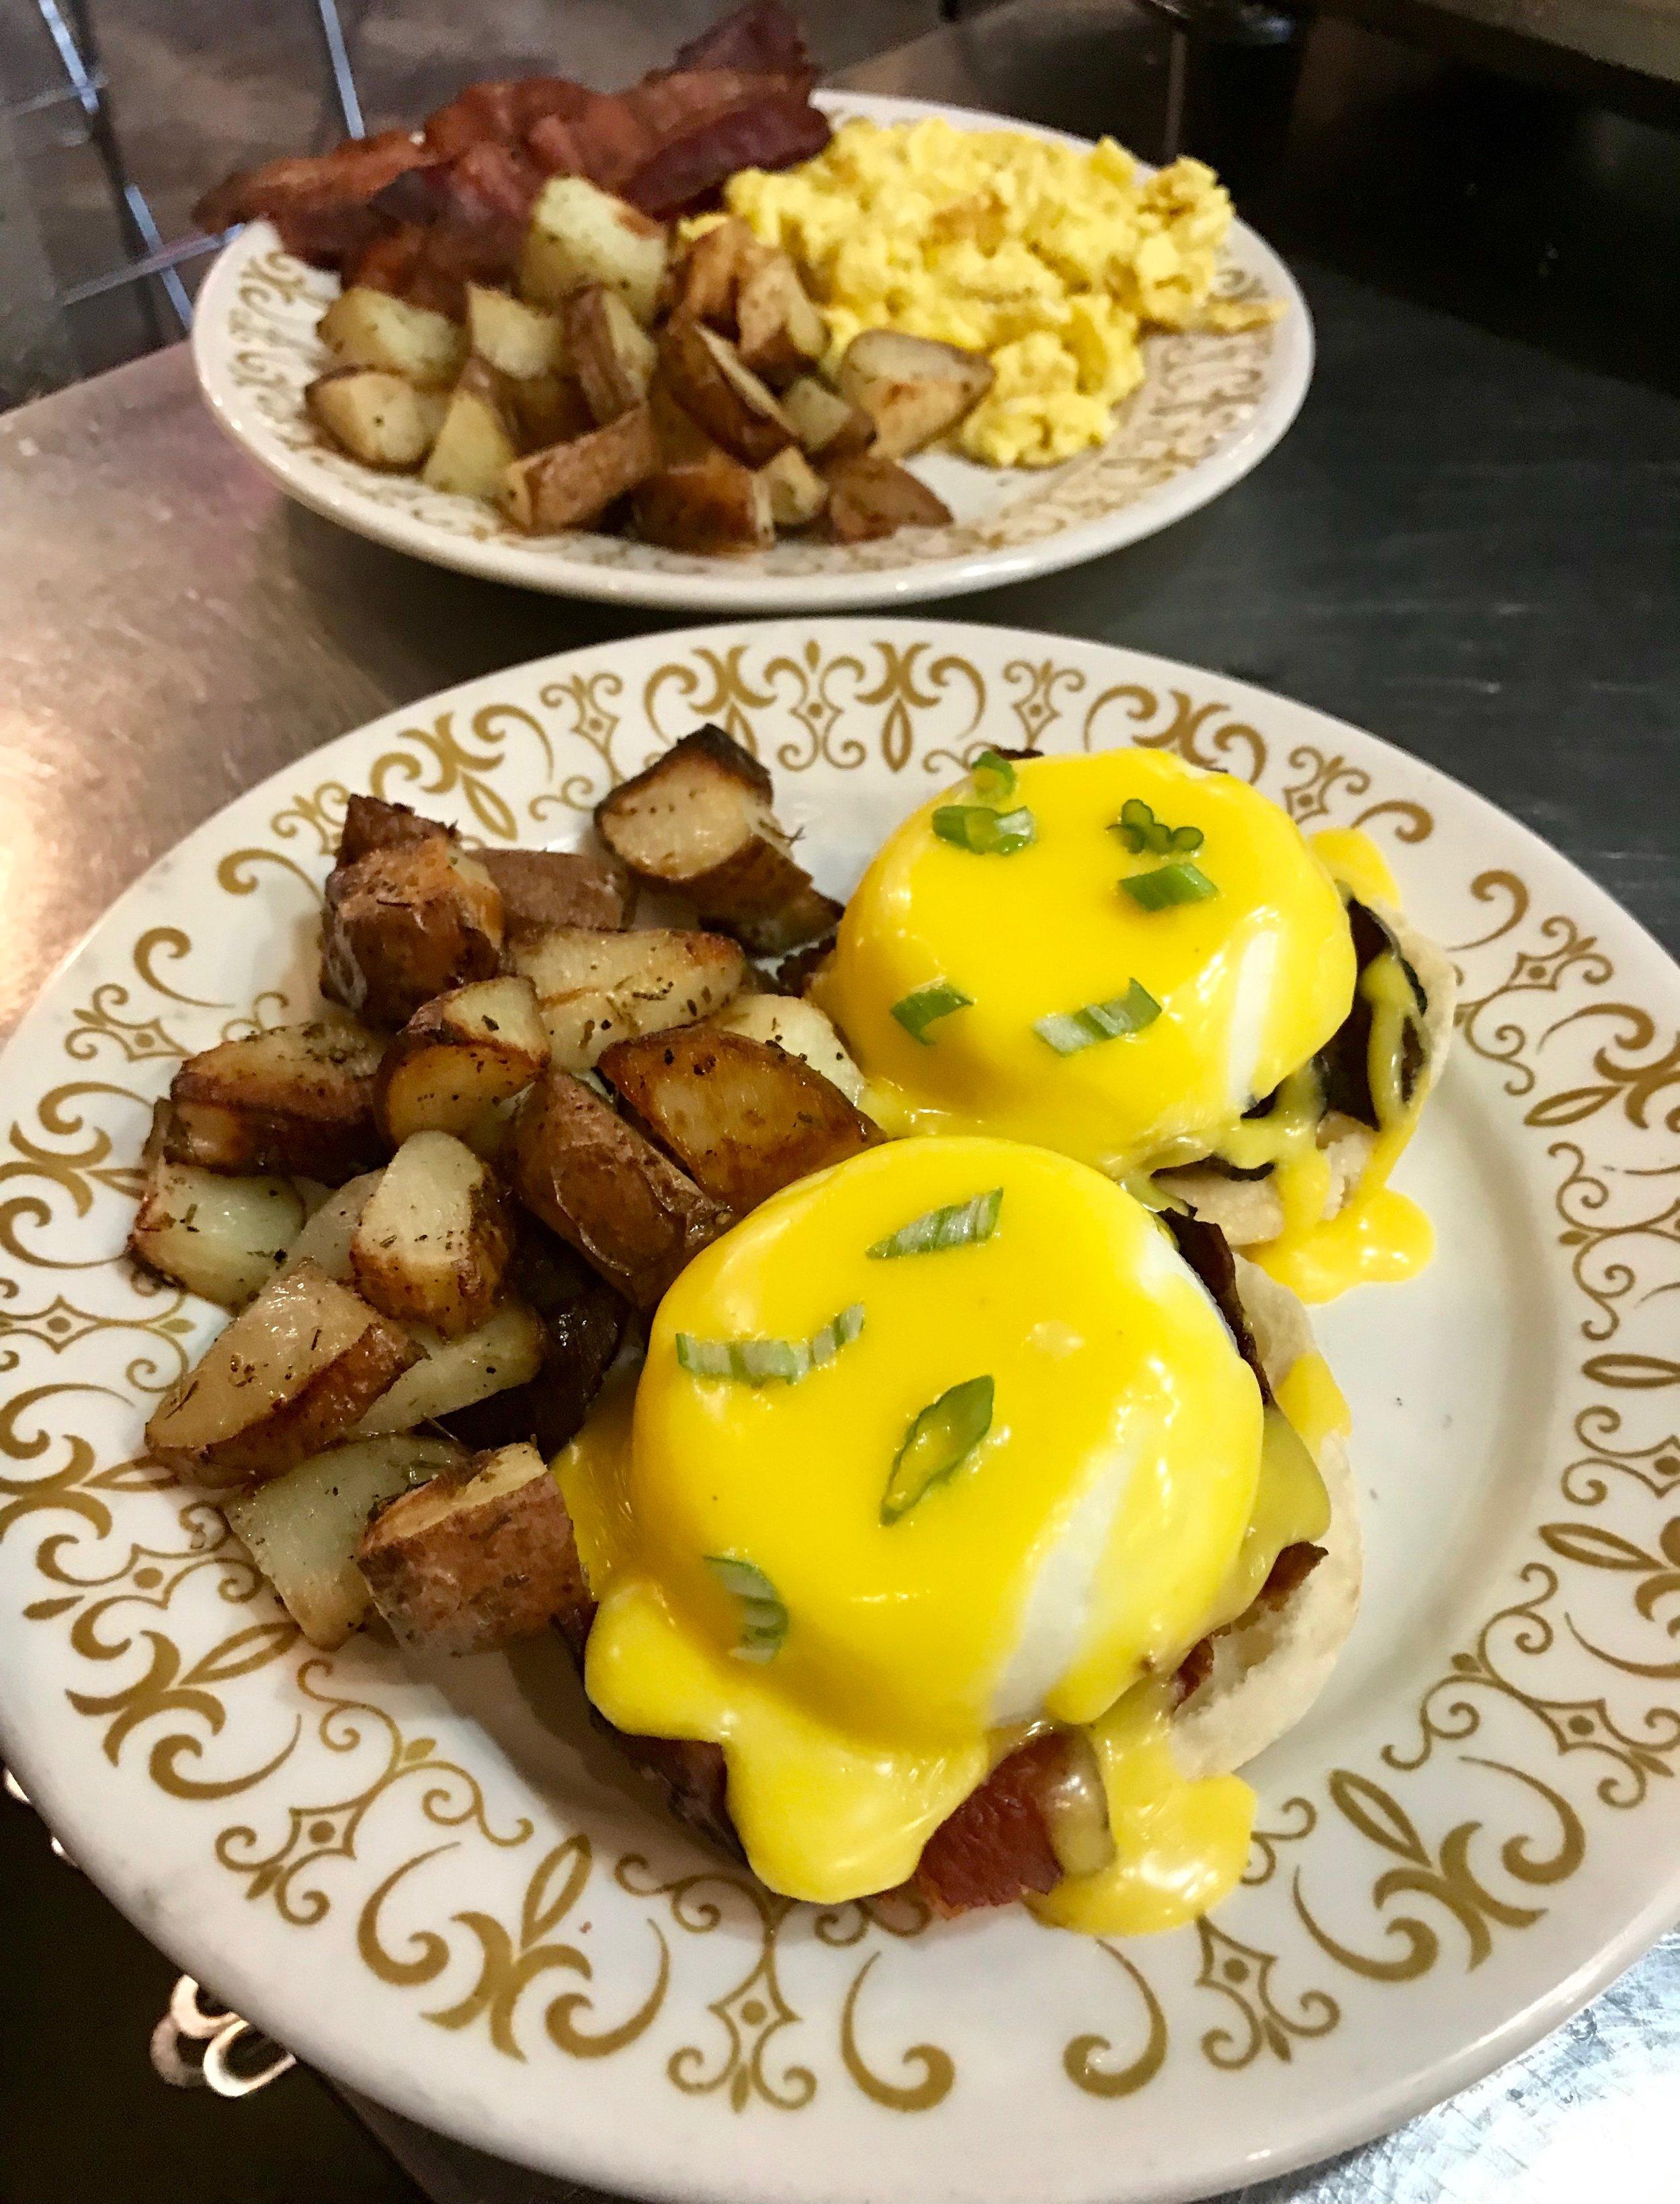 sb eggs Bennie and egg plate.JPG